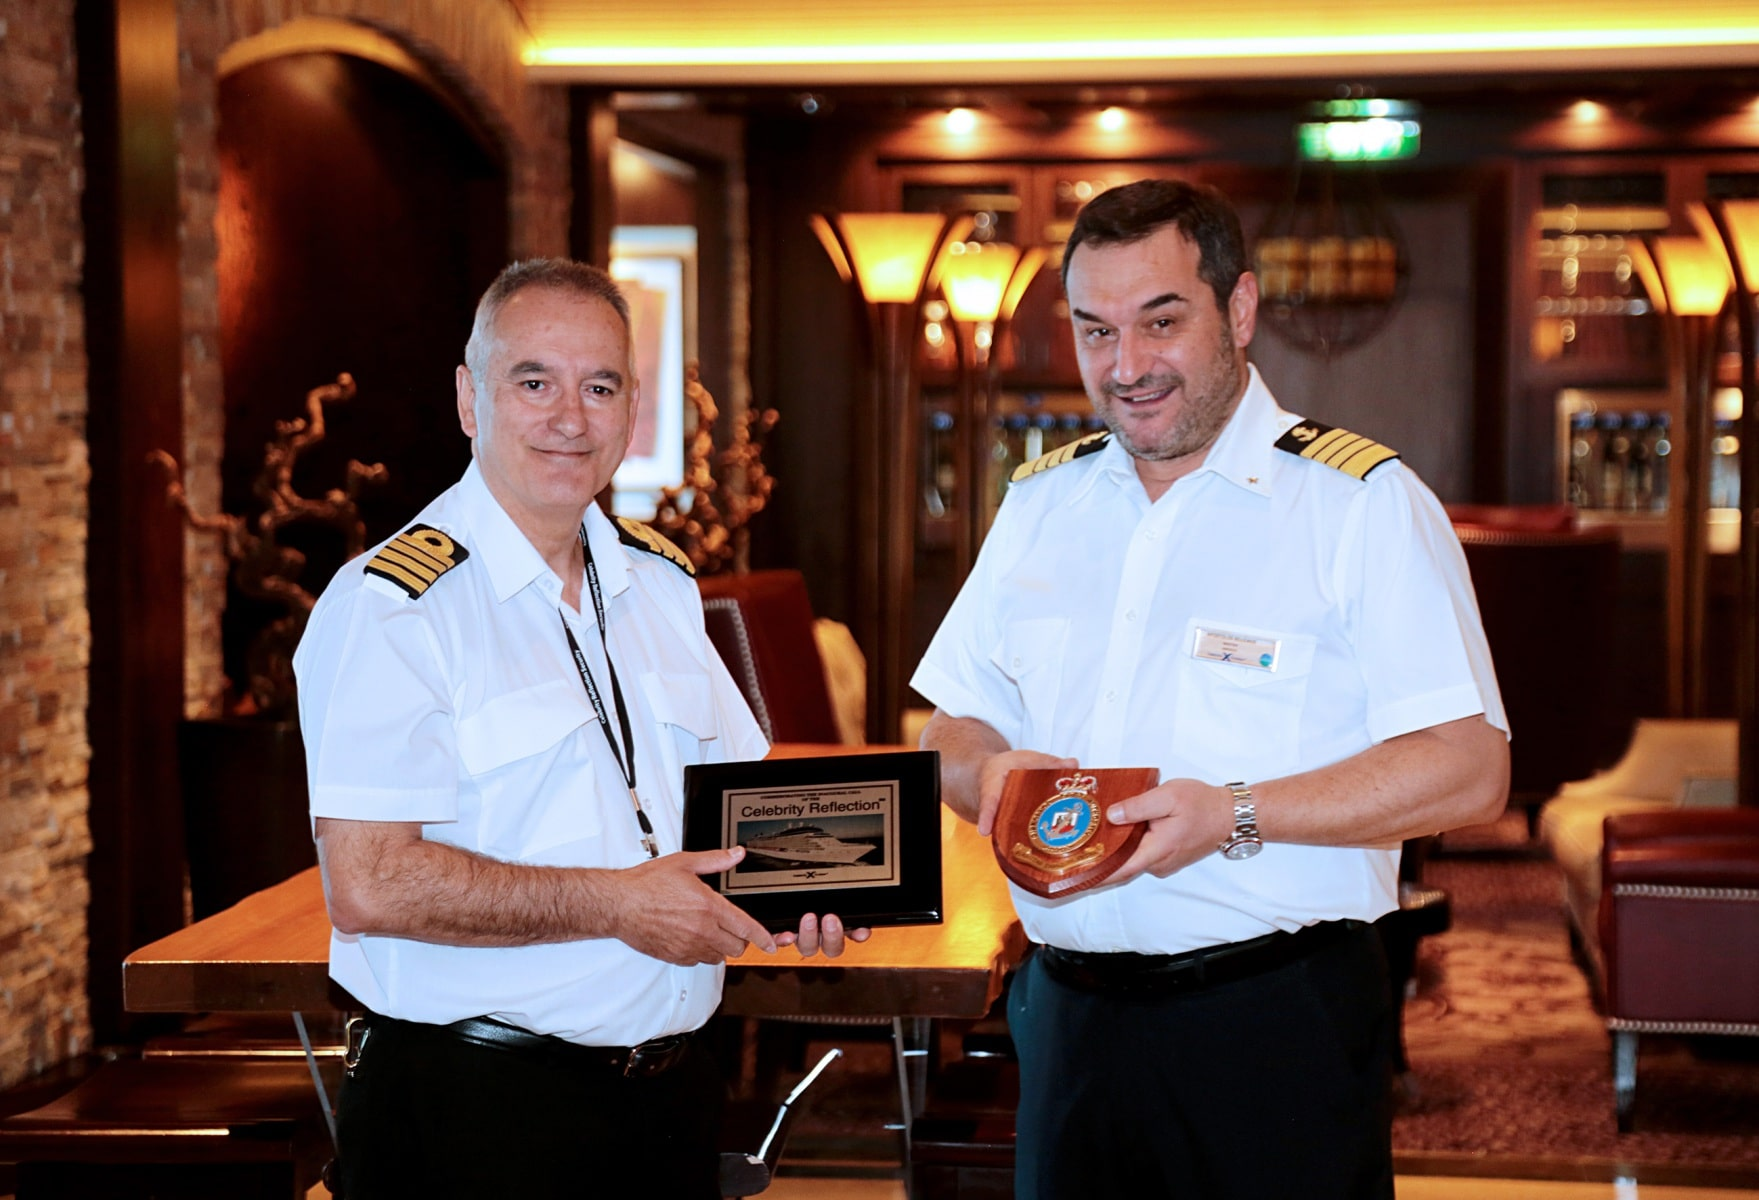 08-may-2017-36visita-inaugural-del-crucero-celebrity-or-reflection-a-gibraltar_34606275221_o